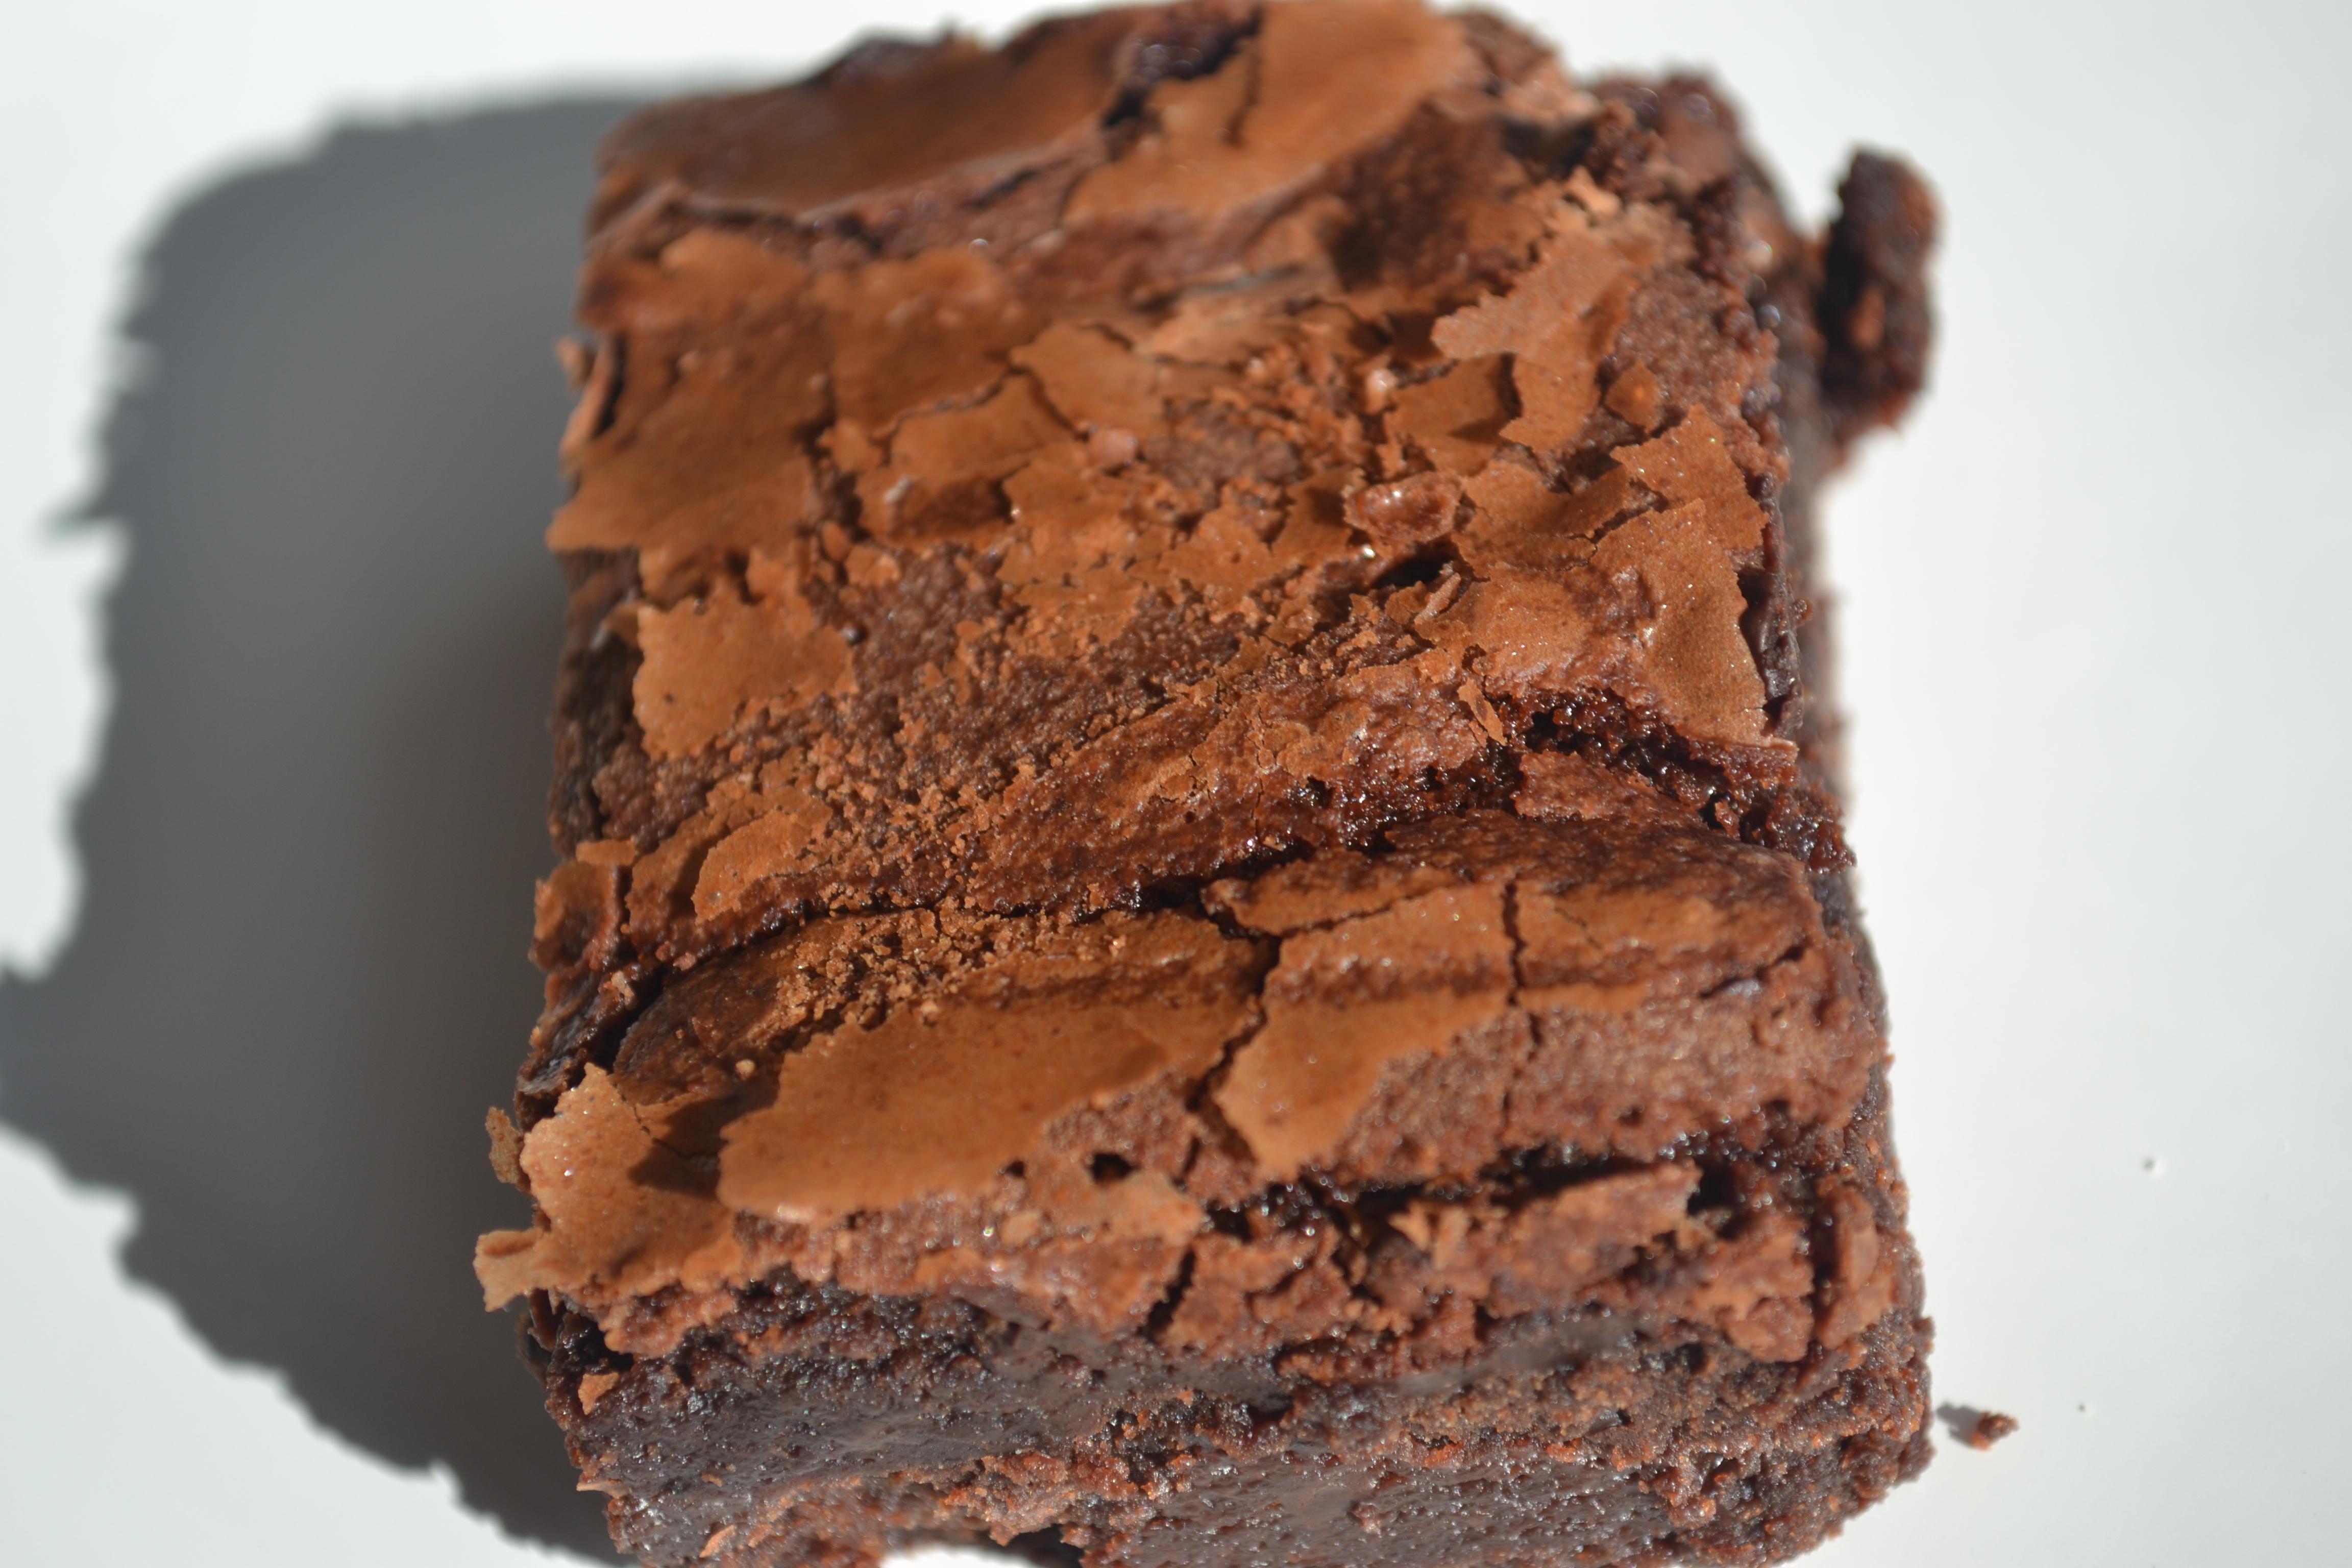 18 Chocolate Brownies with White Chocolate Chunks